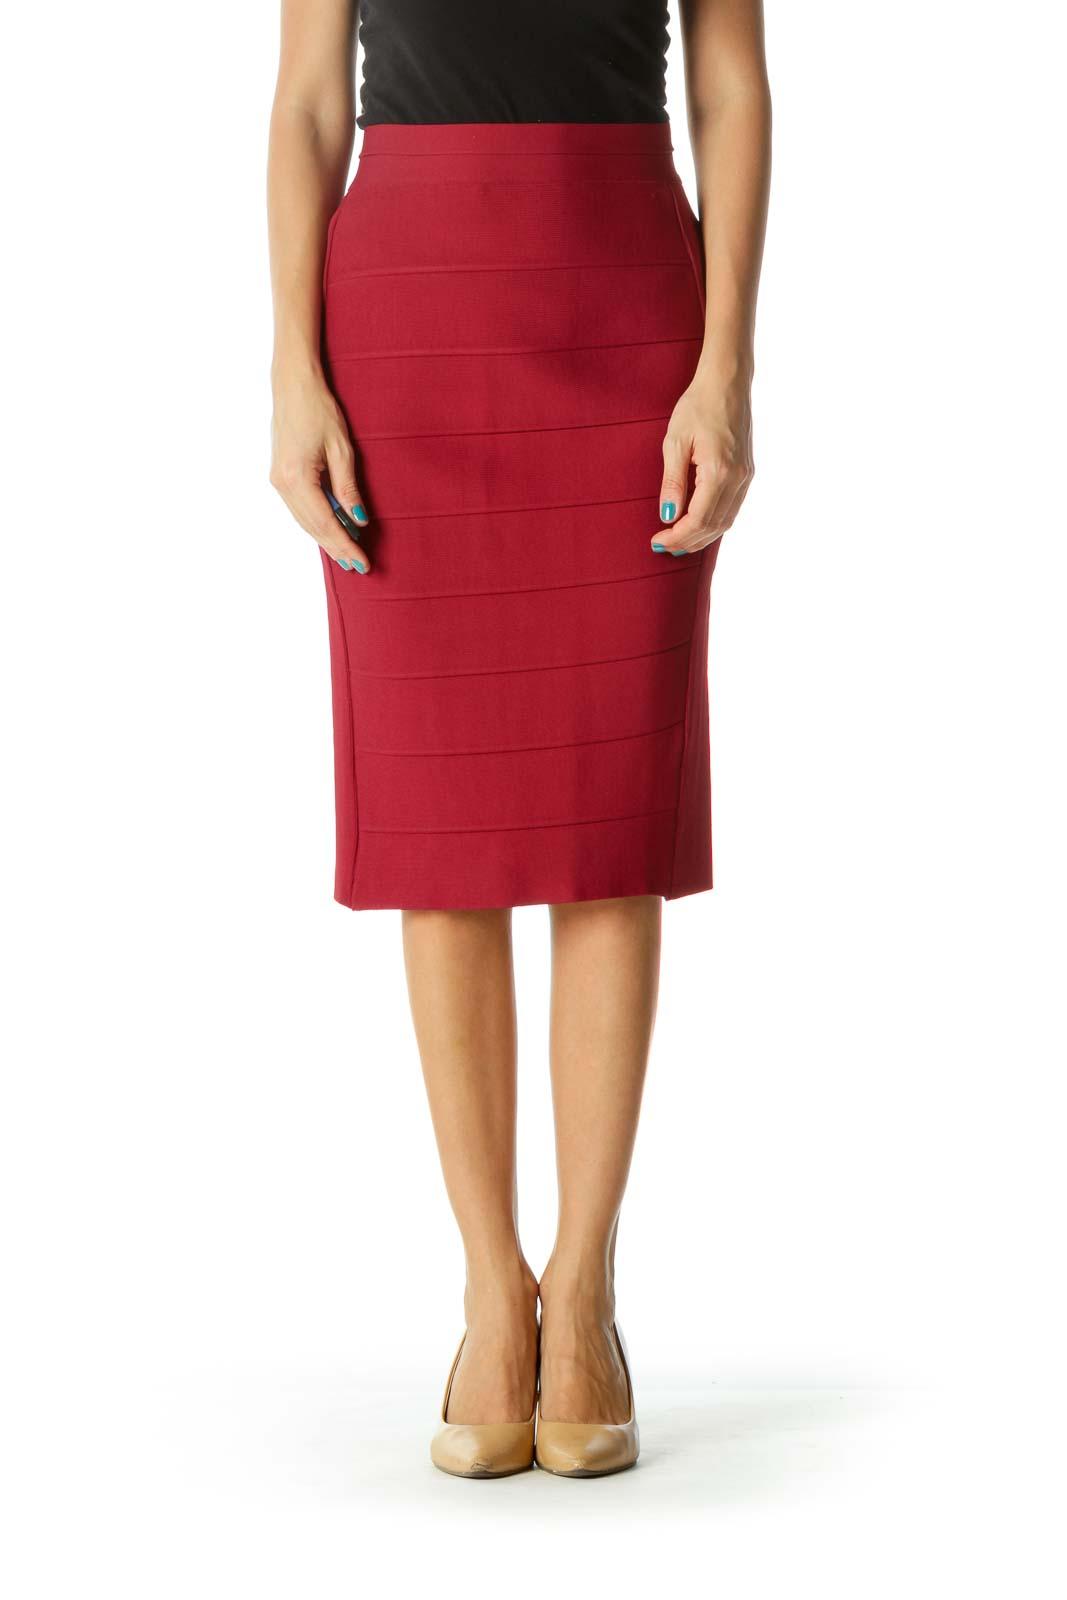 Burgundy Pencil Skirt Front